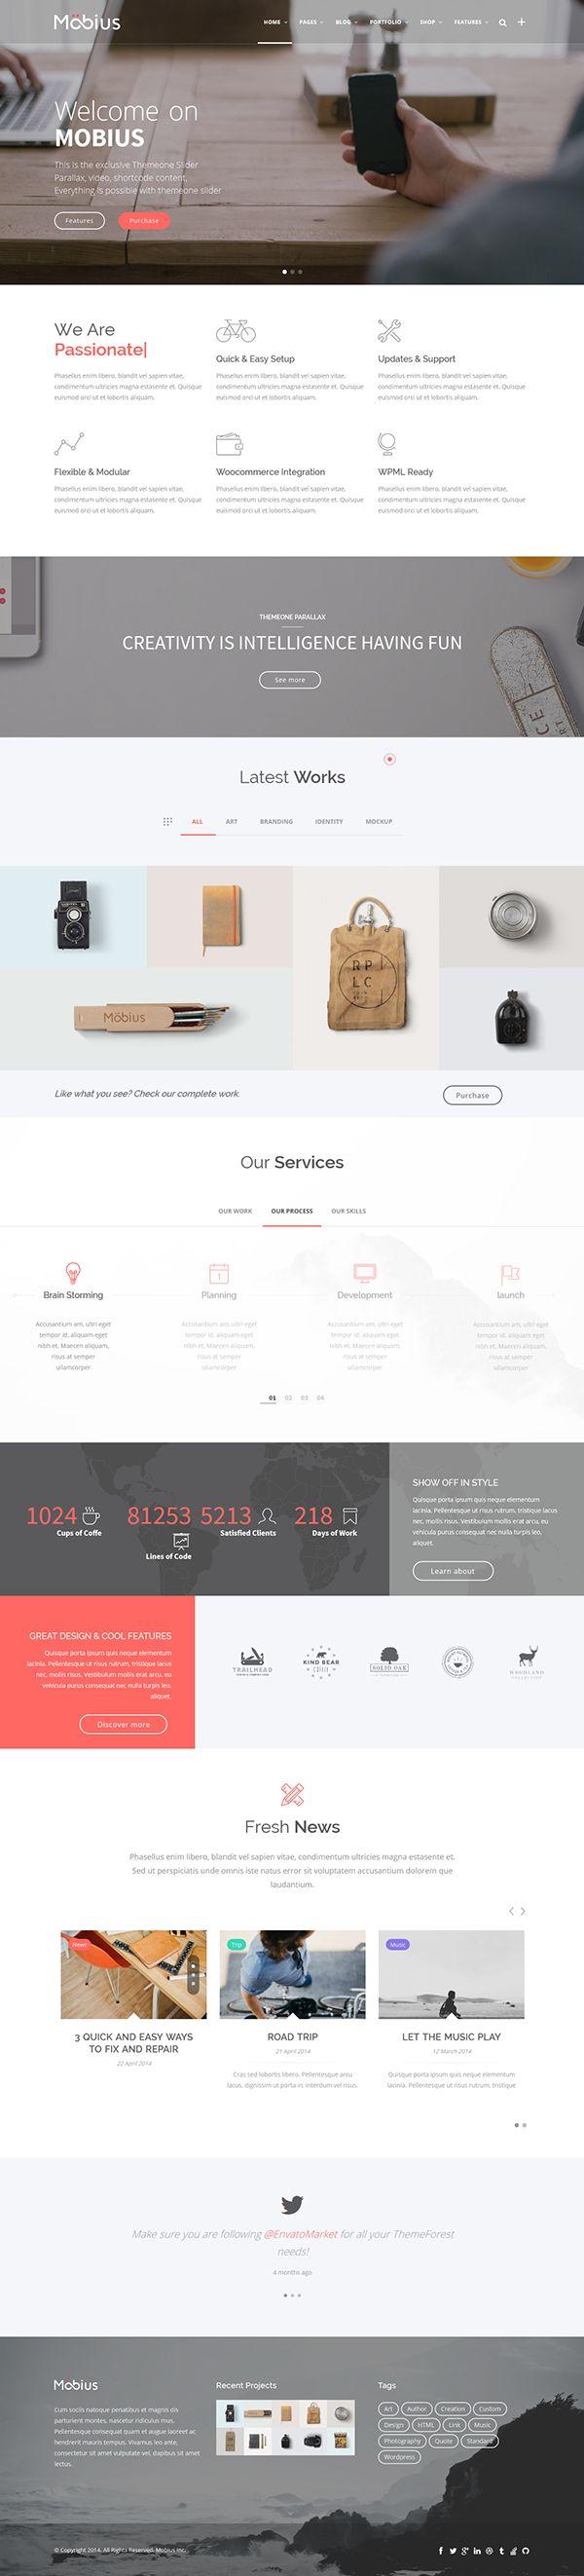 Mobius - Responsive Multi-Purpose WordPress Theme on Web Design Served